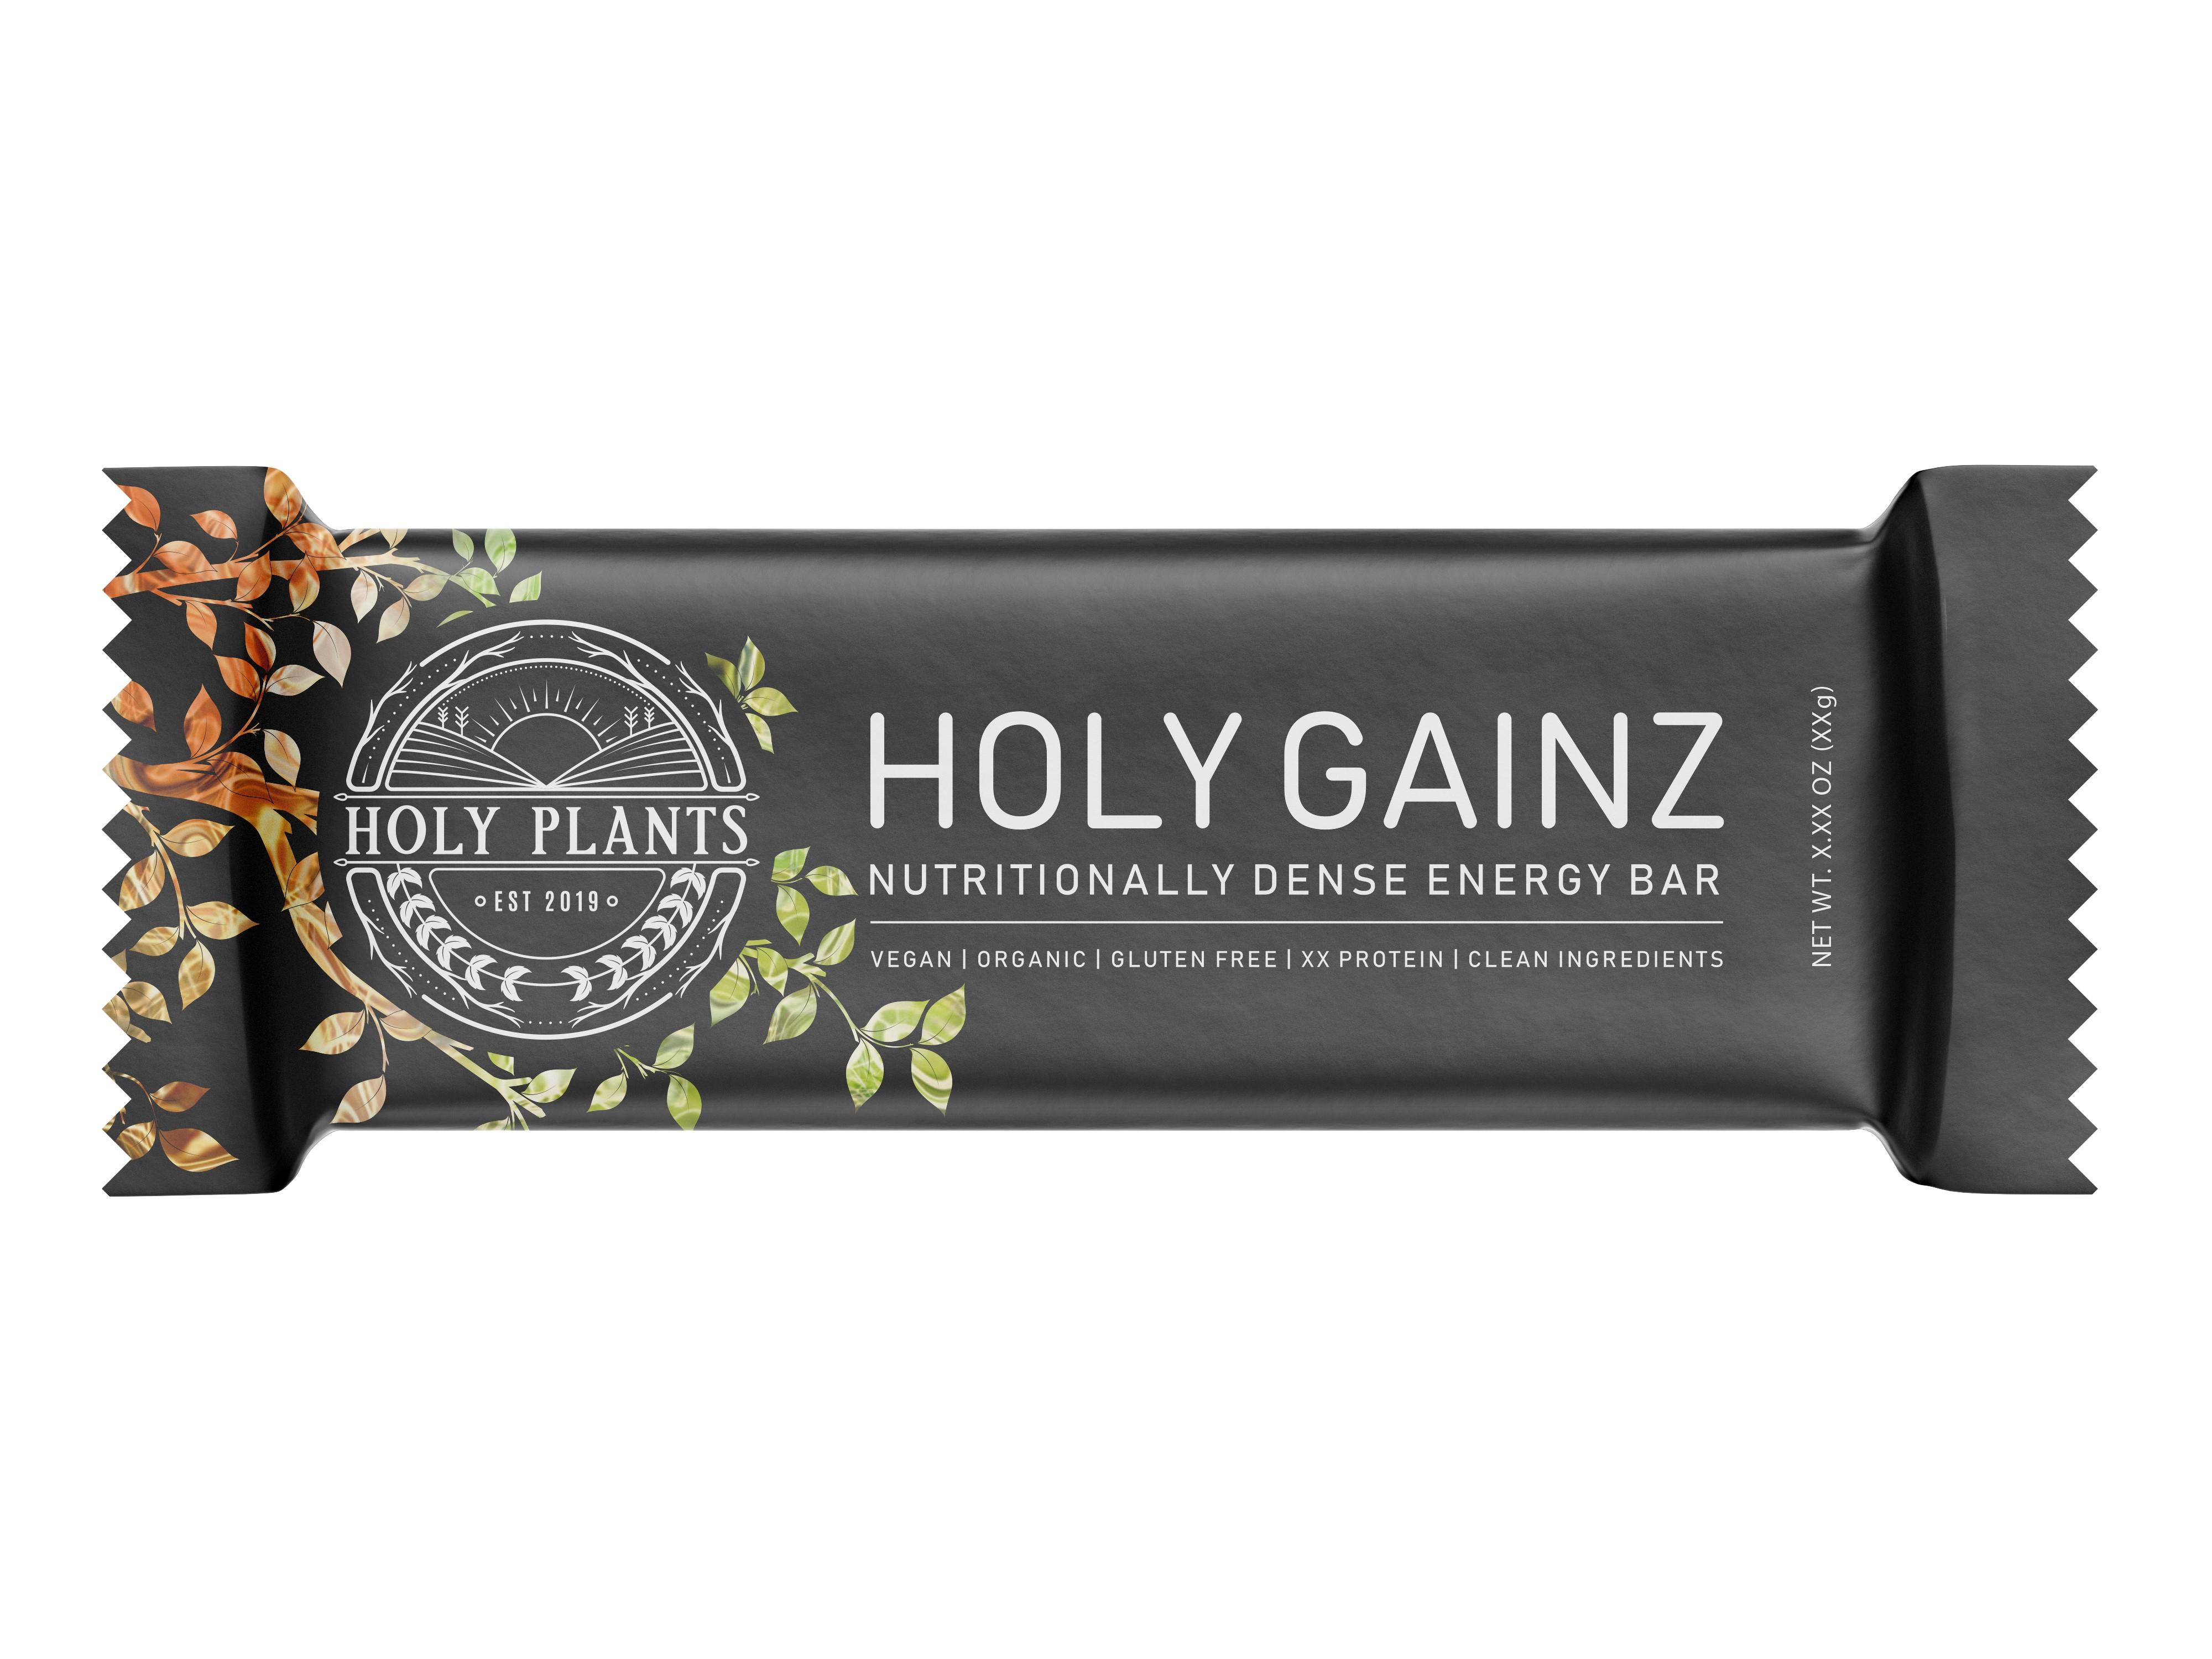 Wrapper, logo and box for a plant-based nutrient dense vegan bar.